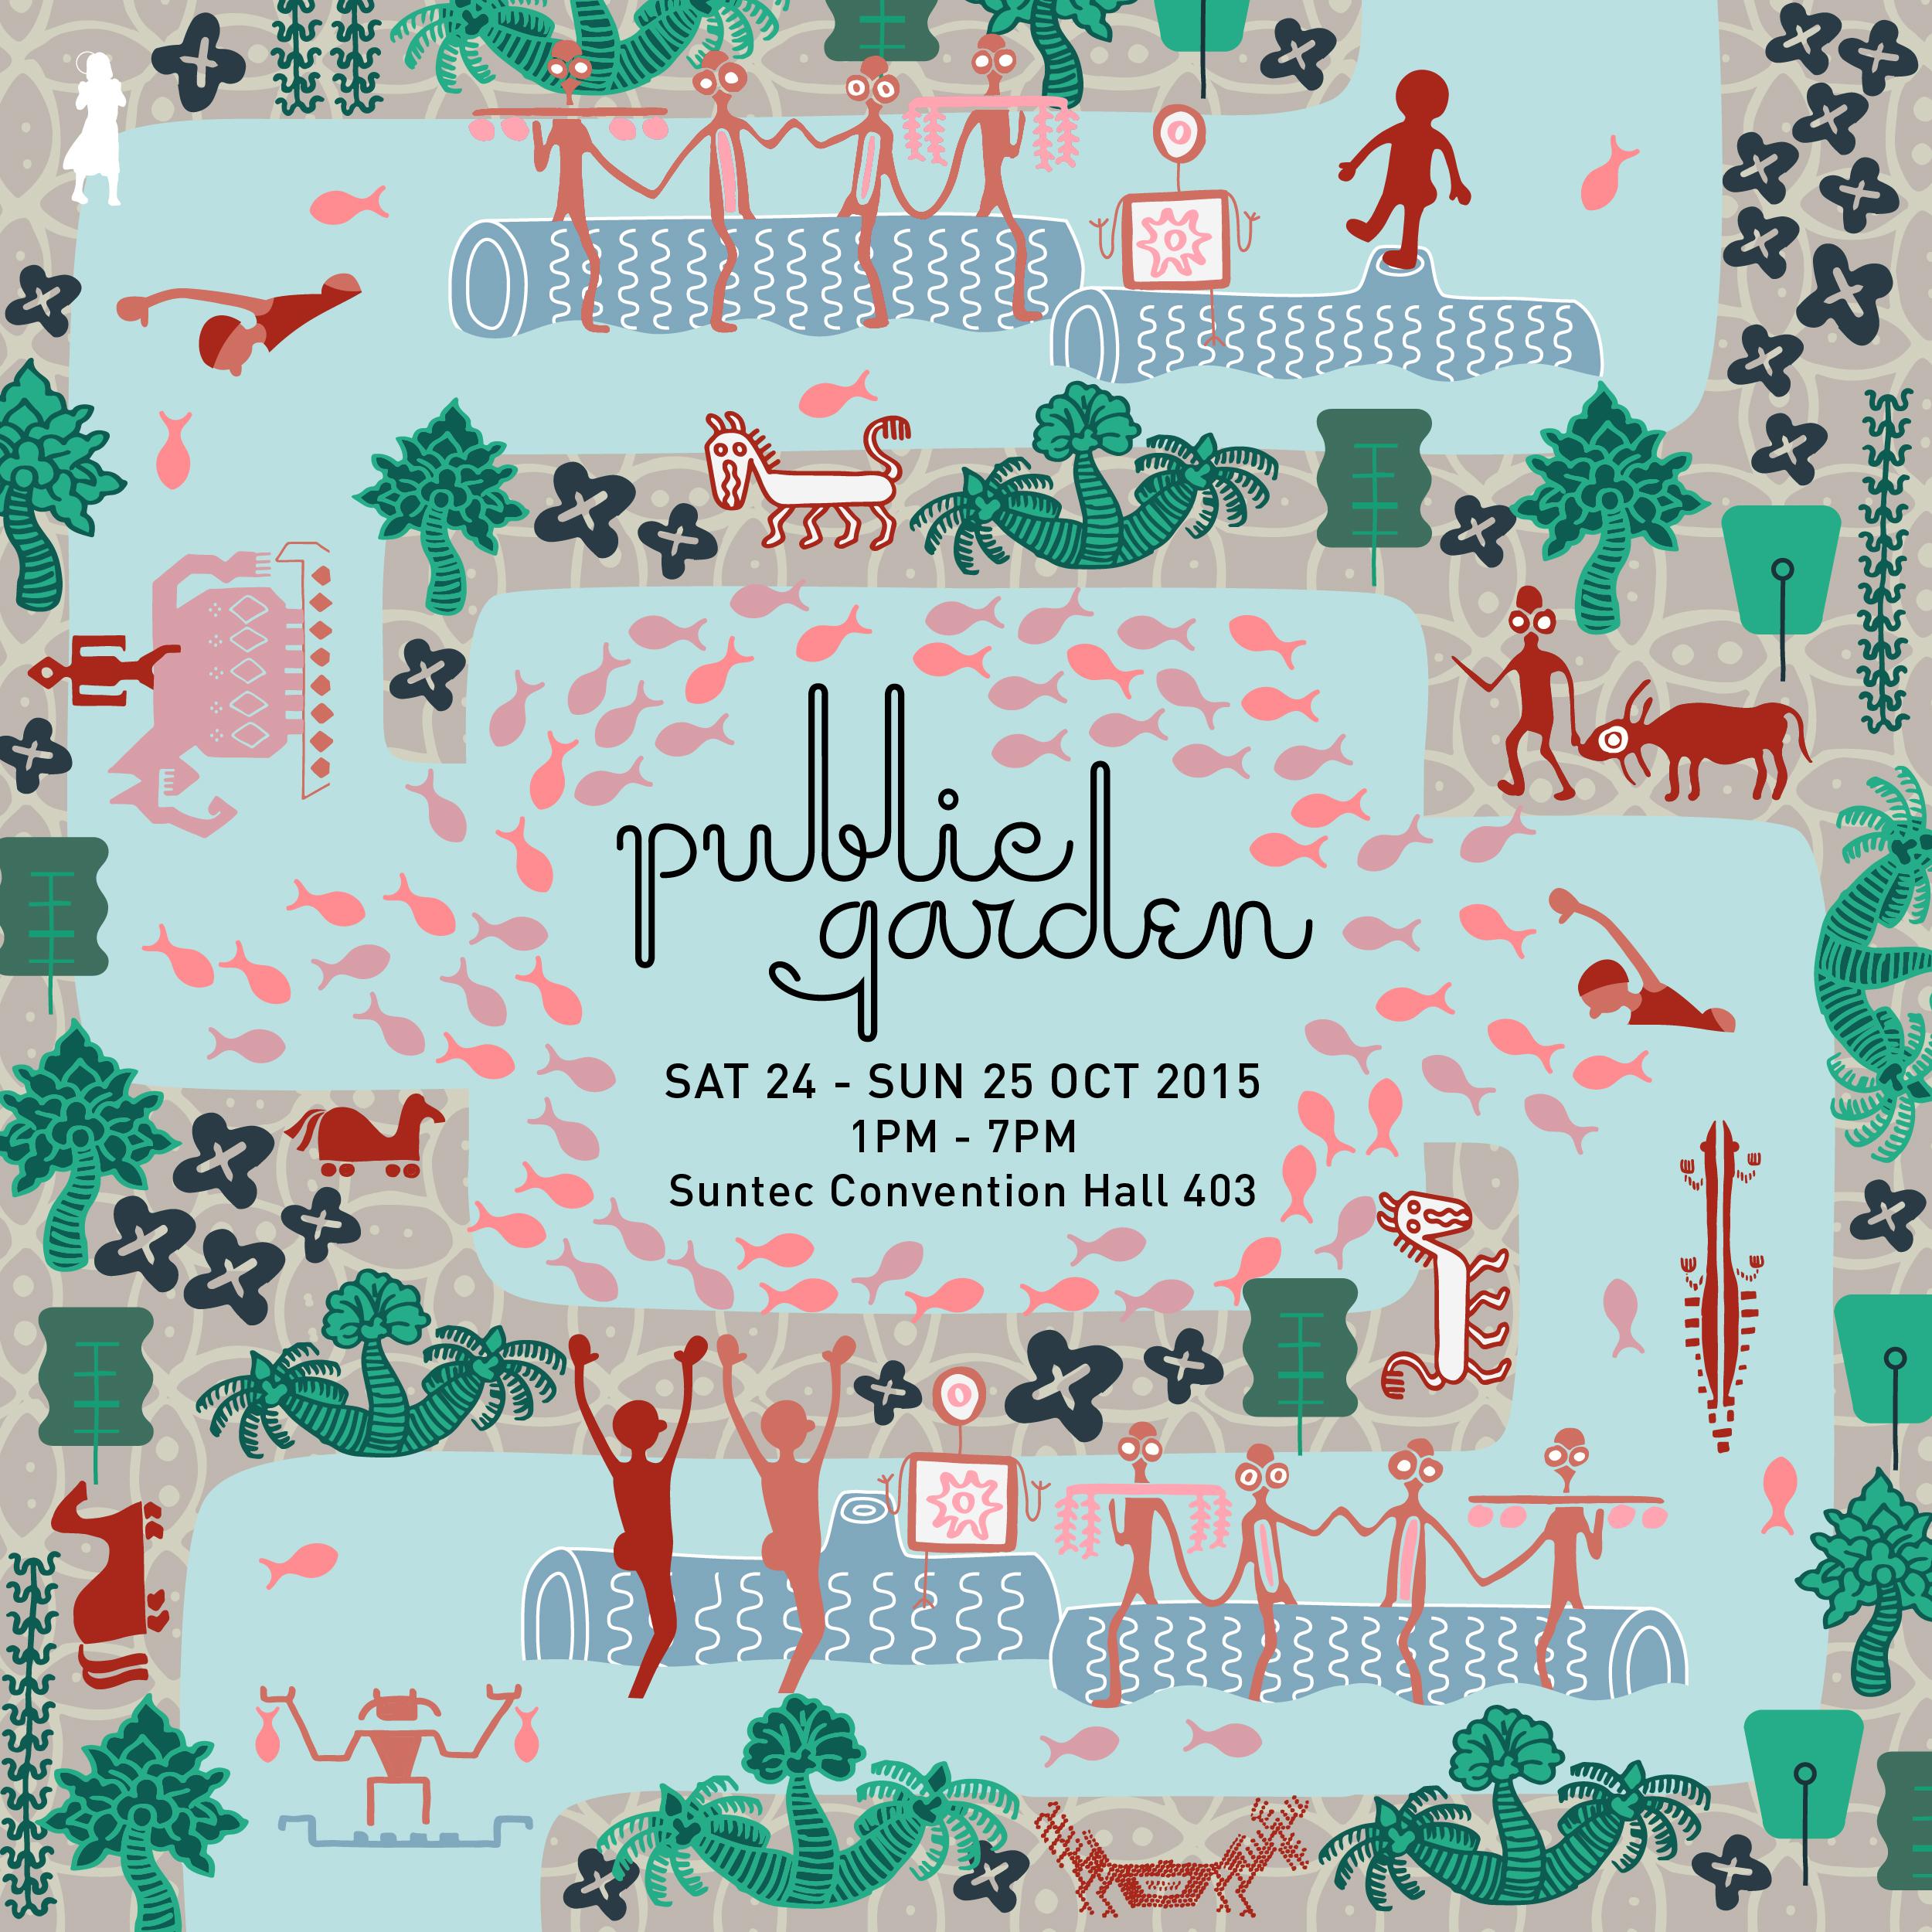 Public Garden Sat 24 - Sun 25 Oct 2015 Instagram Banner